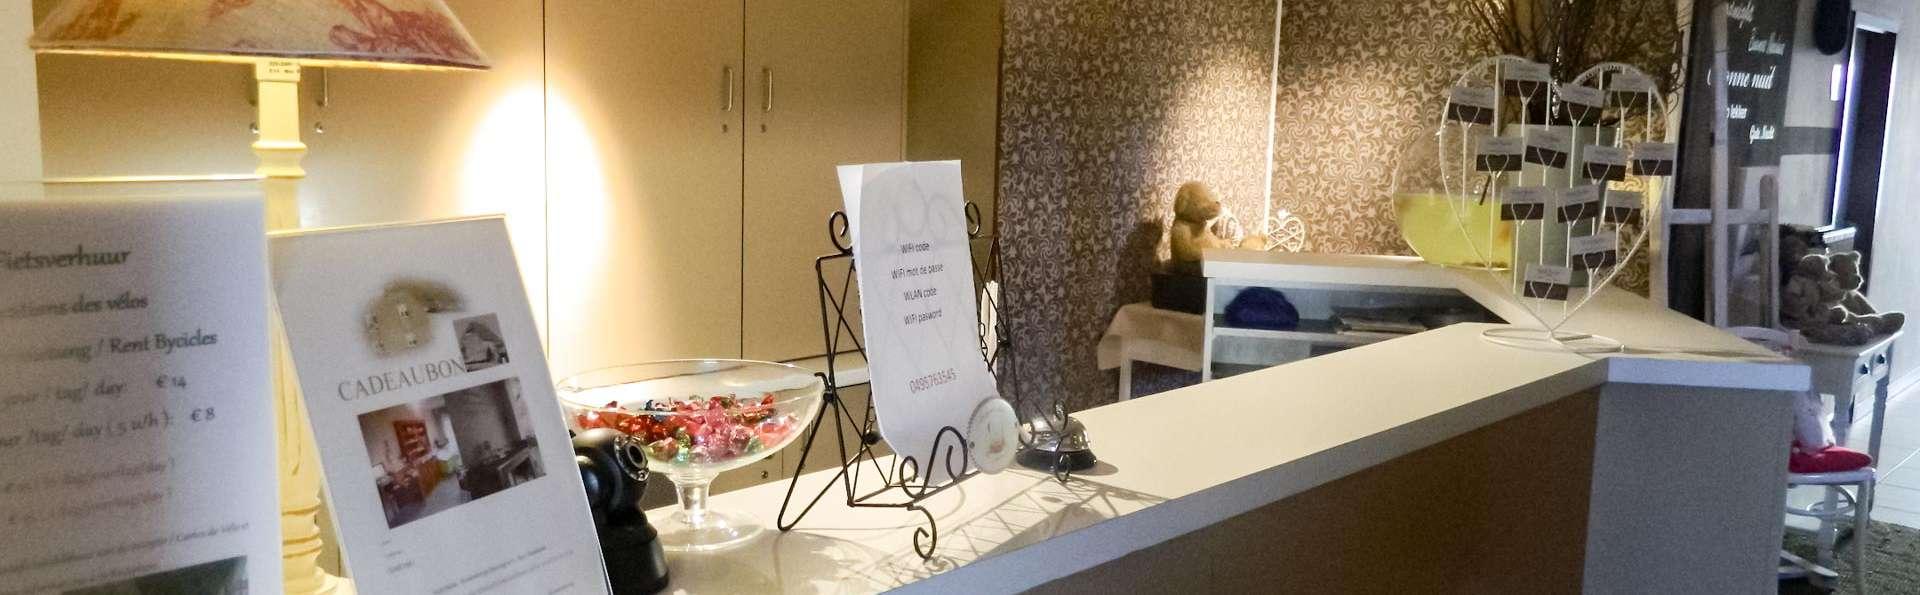 Hotel Butler - EDIT_NEW_LOBBY_01.jpg